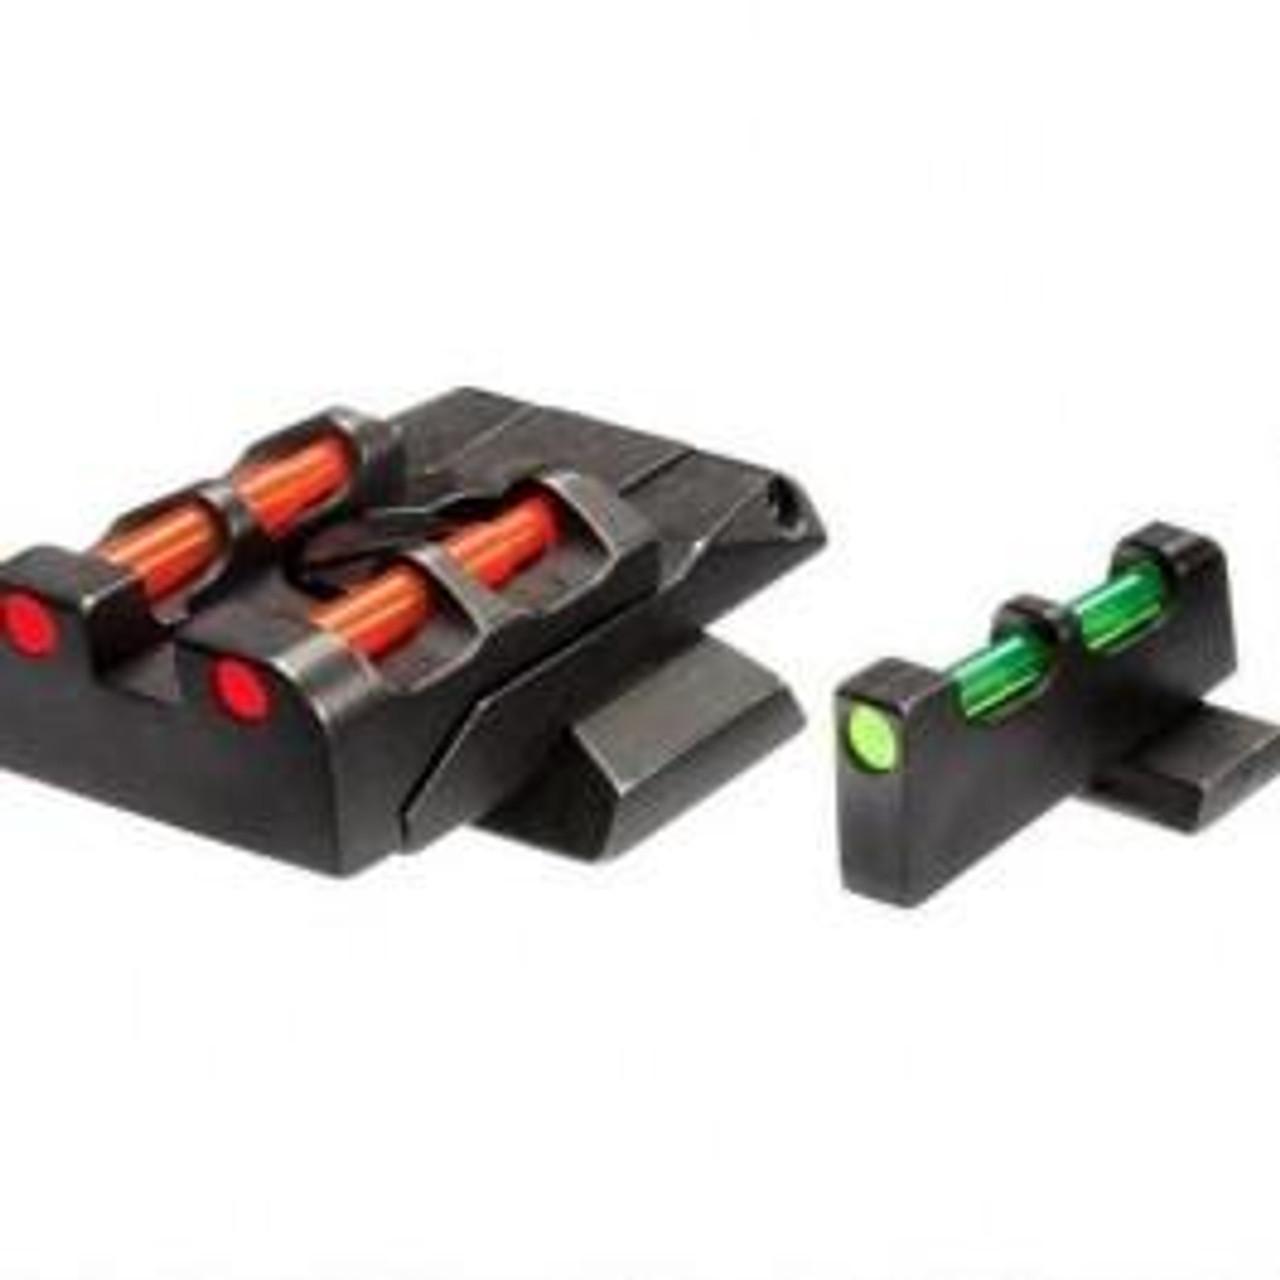 HI-VIZ Fiber Optic Adjustable Sight Set for S&W M&P 9/40